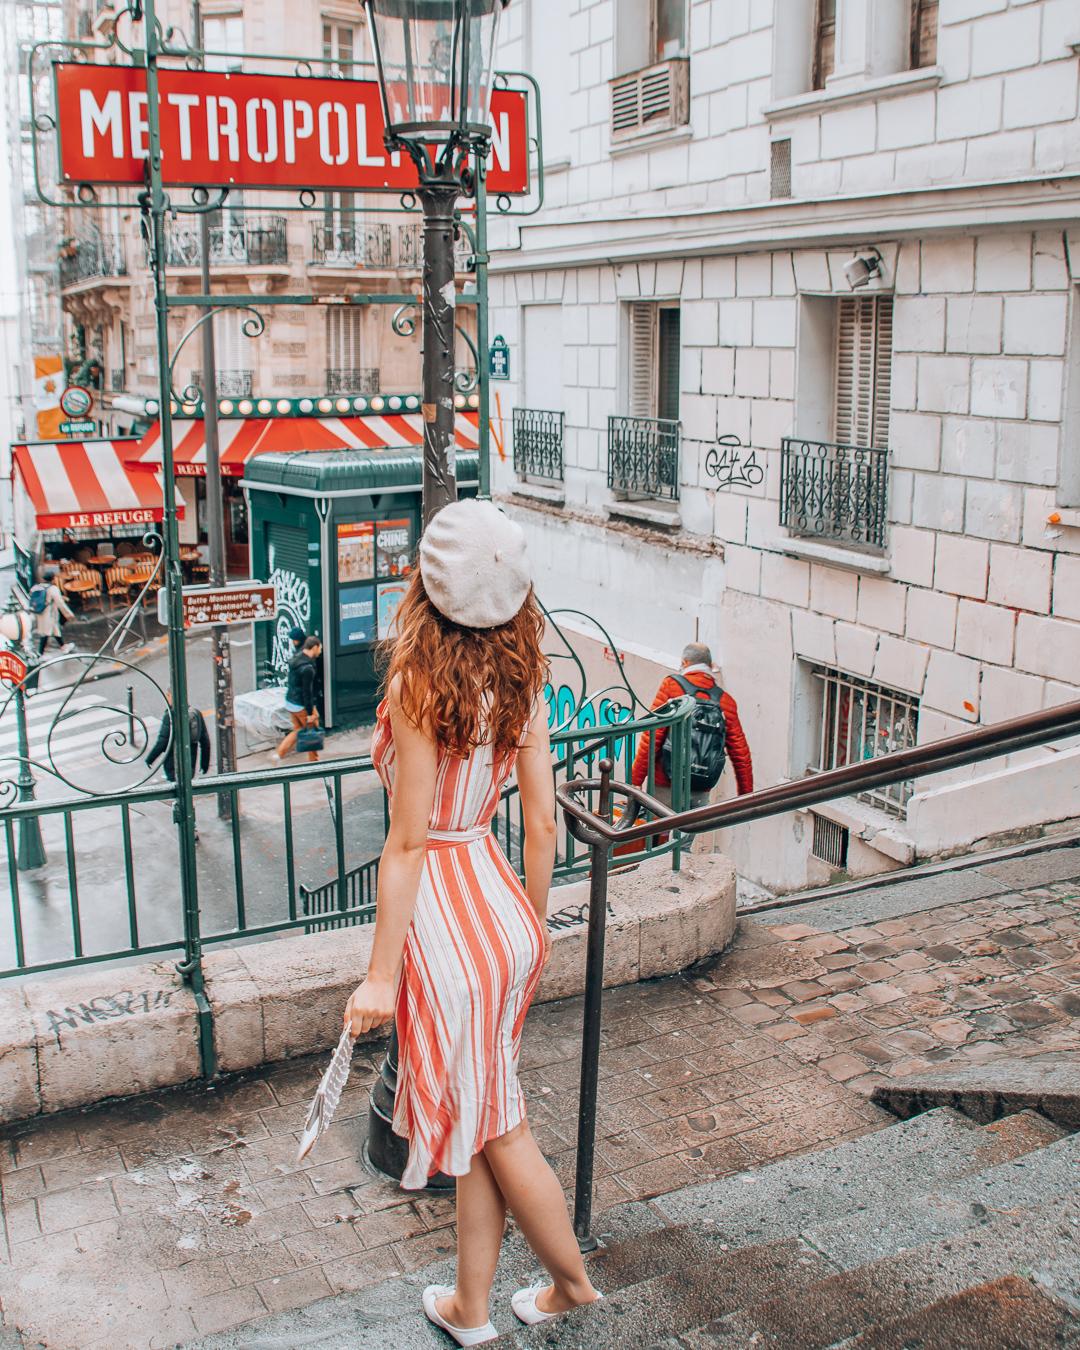 Lamarck-Caulaincourt metro in Paris